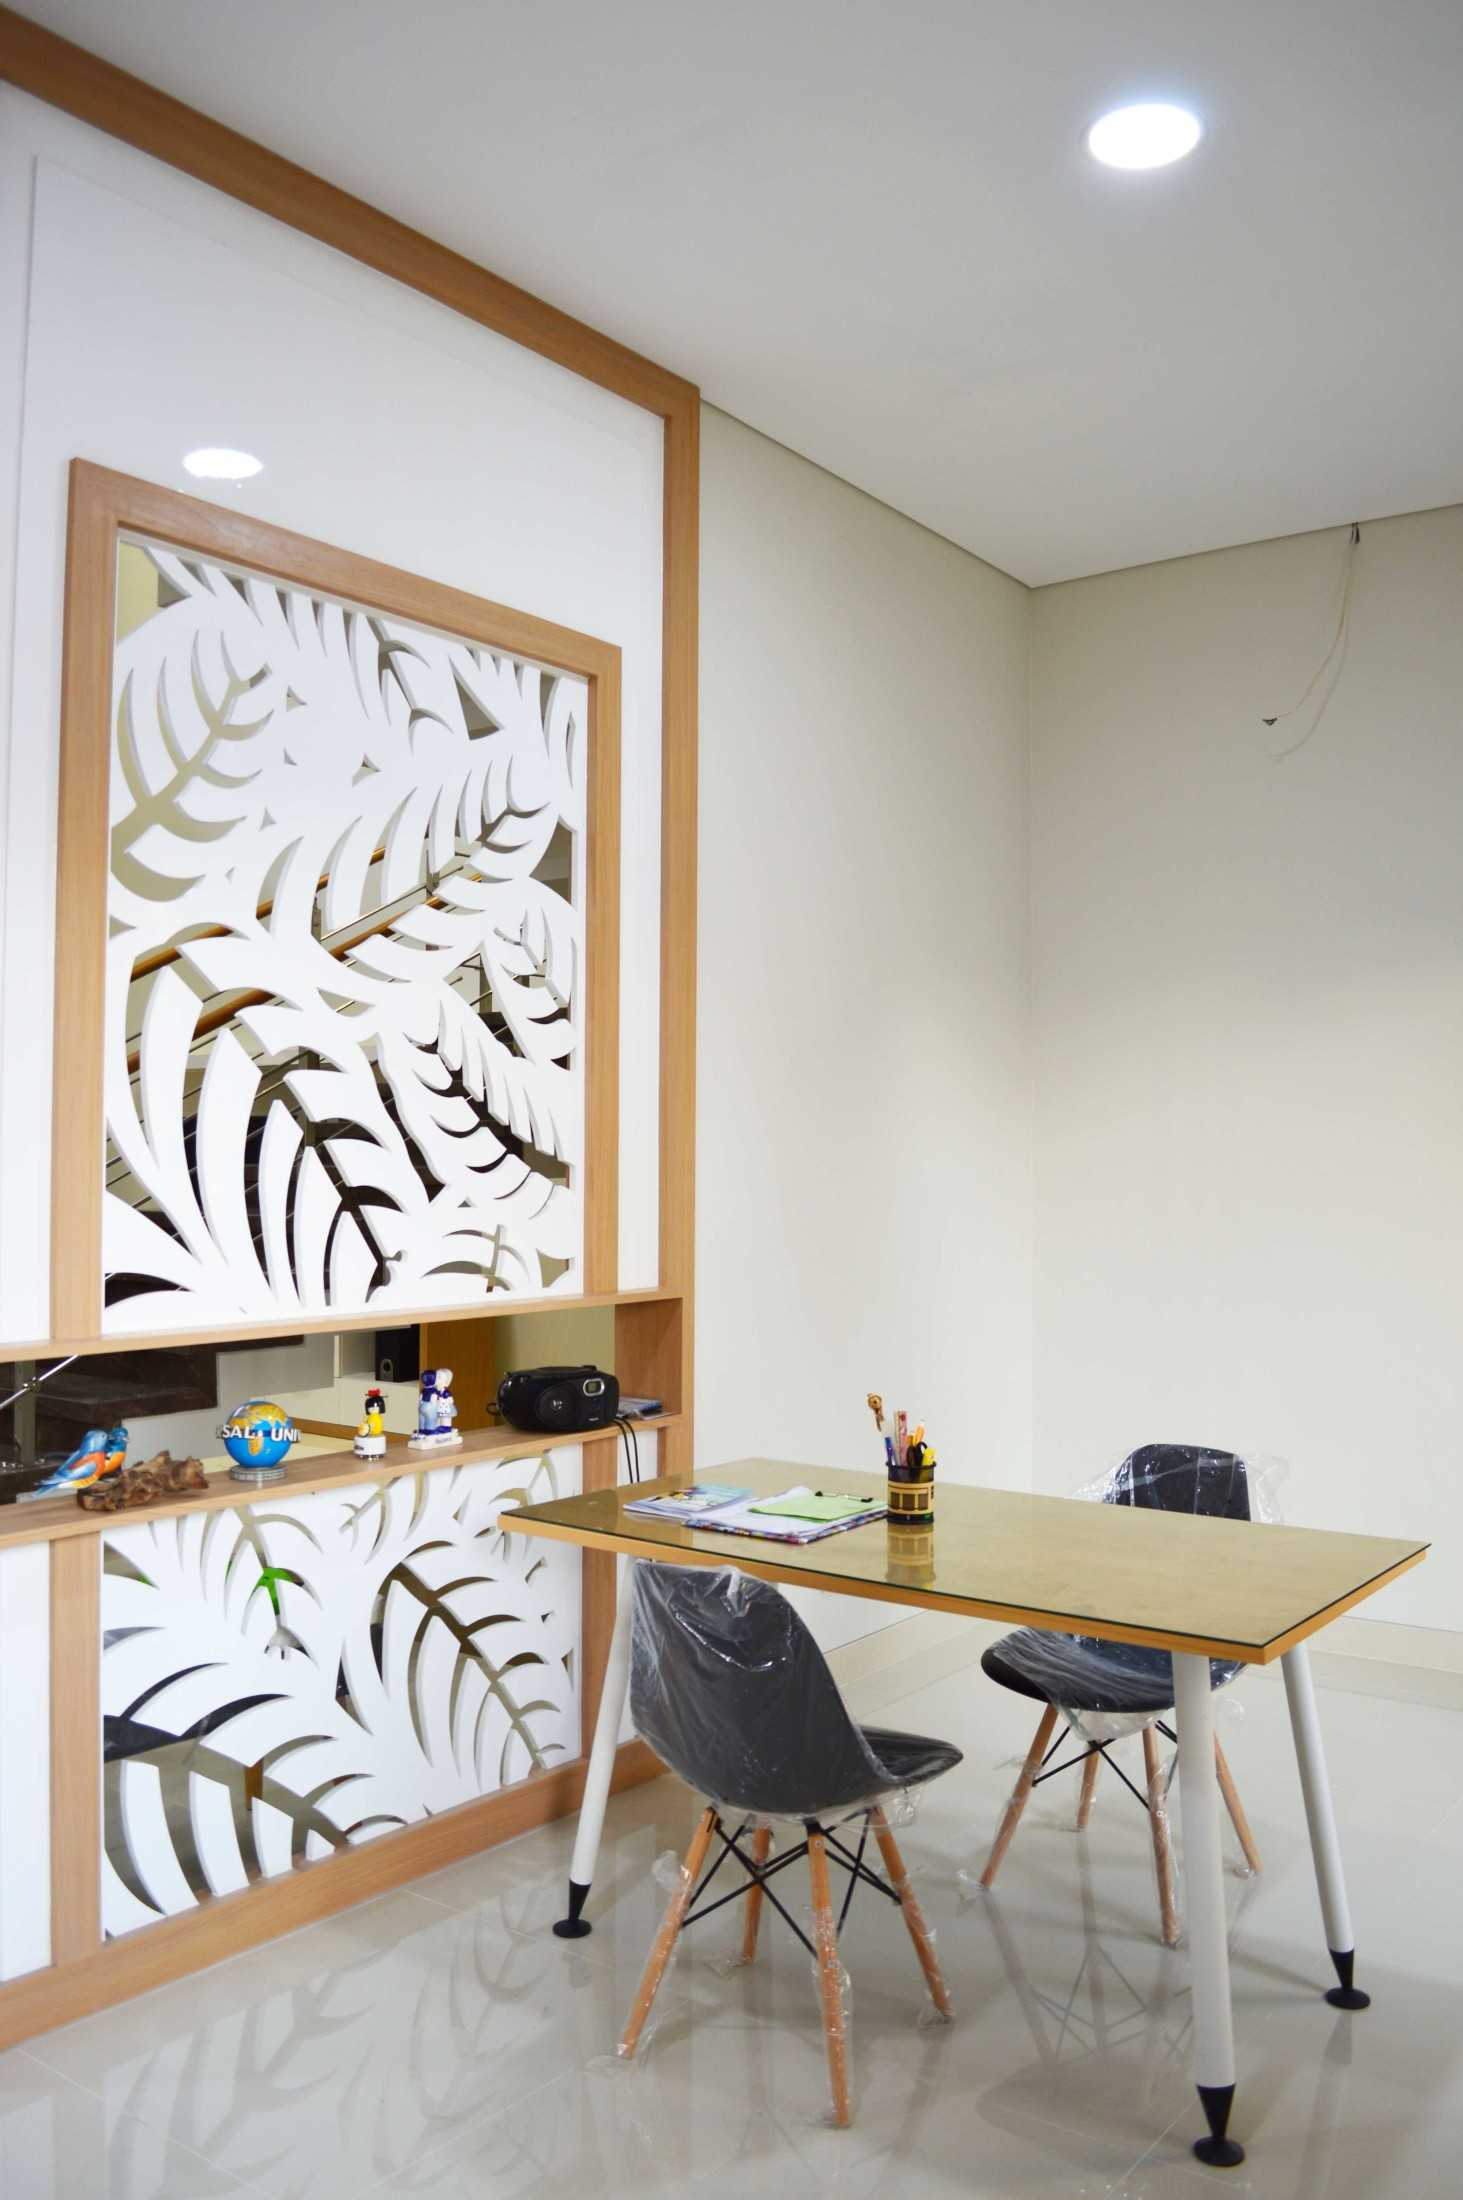 Conarch Studio Modern House With Natural Color Palette Surakarta, Kota Surakarta, Jawa Tengah, Indonesia Surakarta, Kota Surakarta, Jawa Tengah, Indonesia Studying/ Working Space  122997